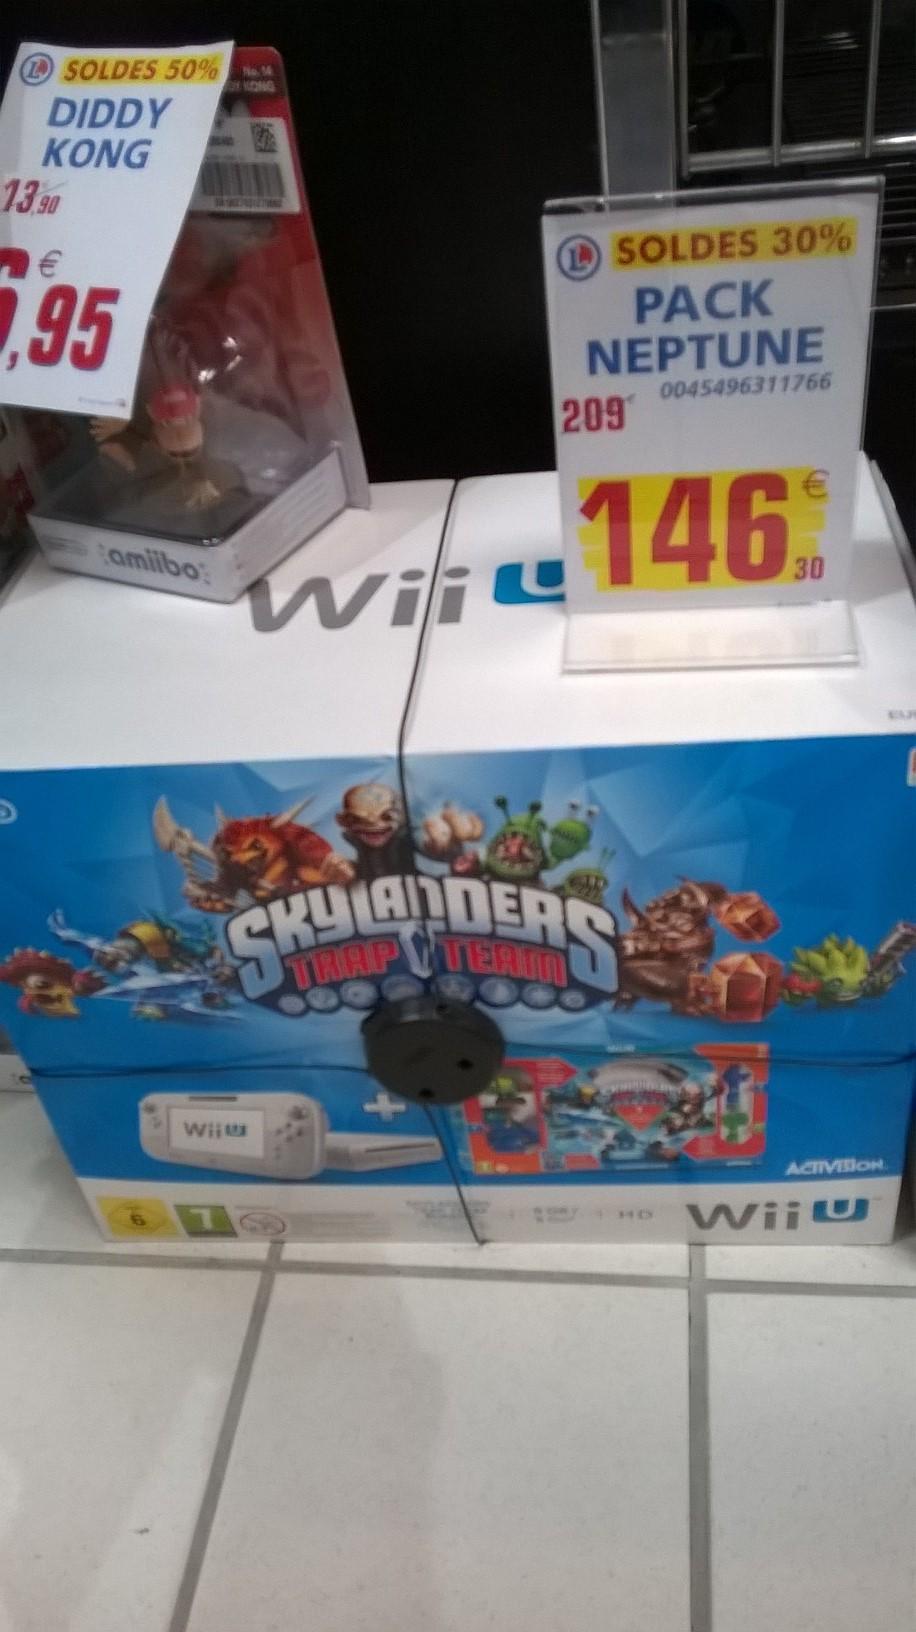 Pack Console Wii U Blanche 8 Go + Skylander Trap Team